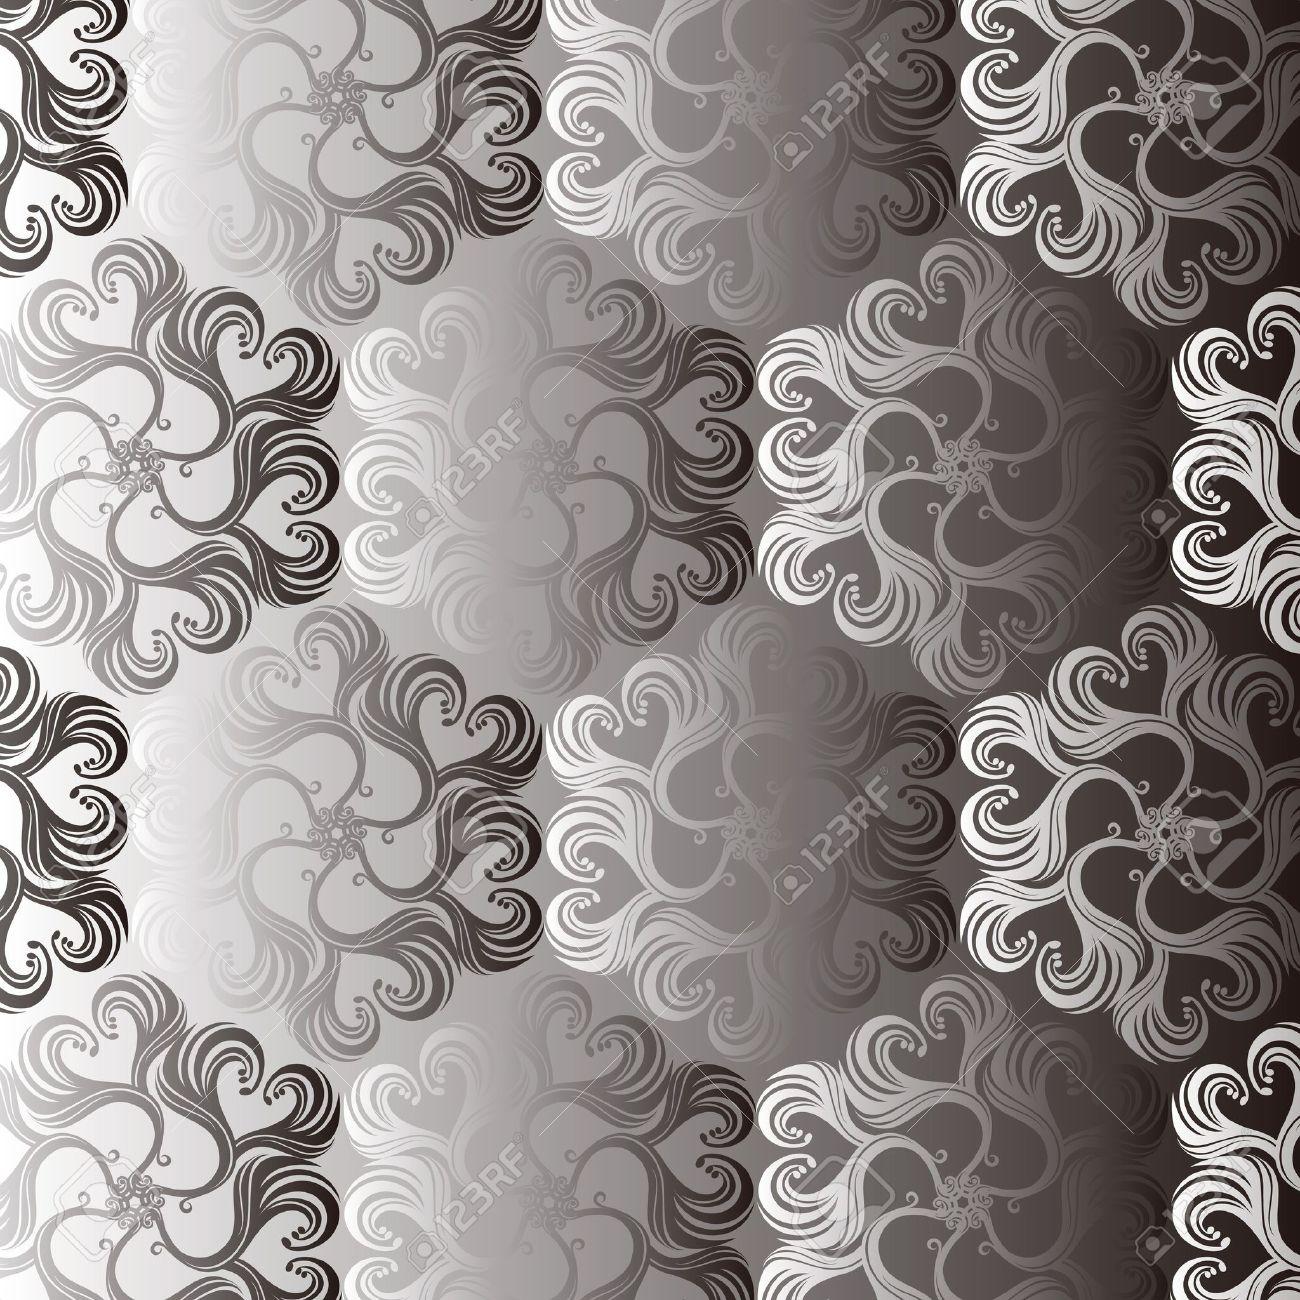 Seamless Damask wallpaper Stock Vector - 12749572